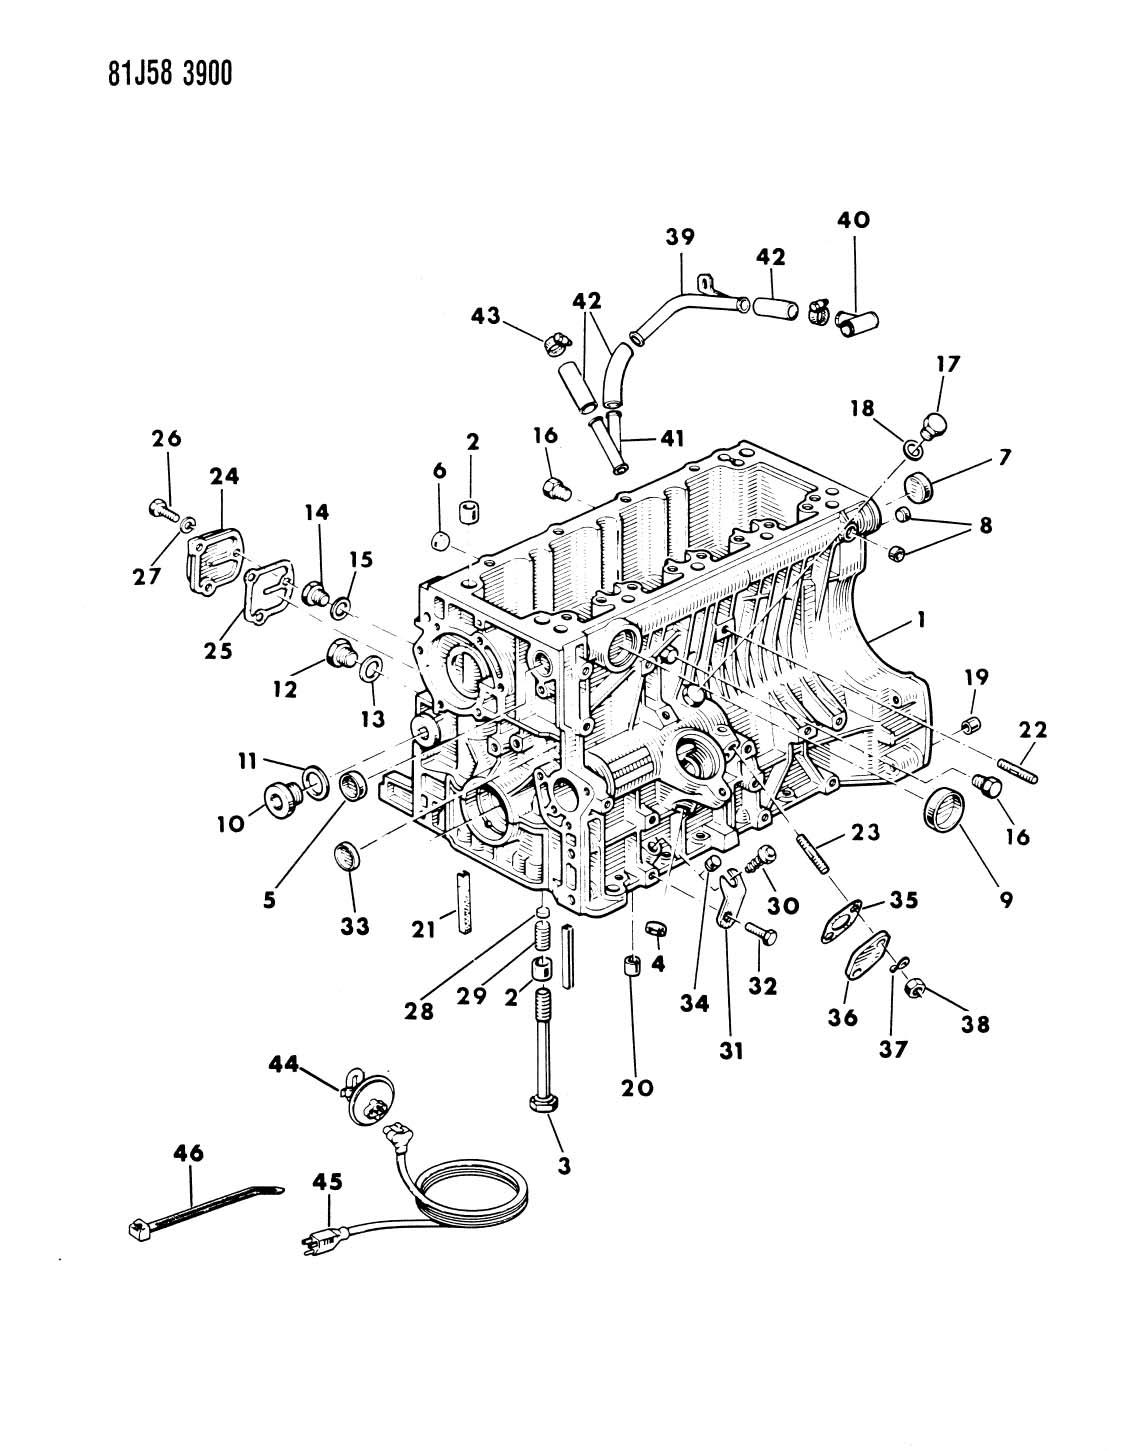 2006 Dodge Ram 1500 Slt Quad Cab 4 7l Magnum V8 A  T 4x4 Strap  Tie  Block Heater Cord  Drain